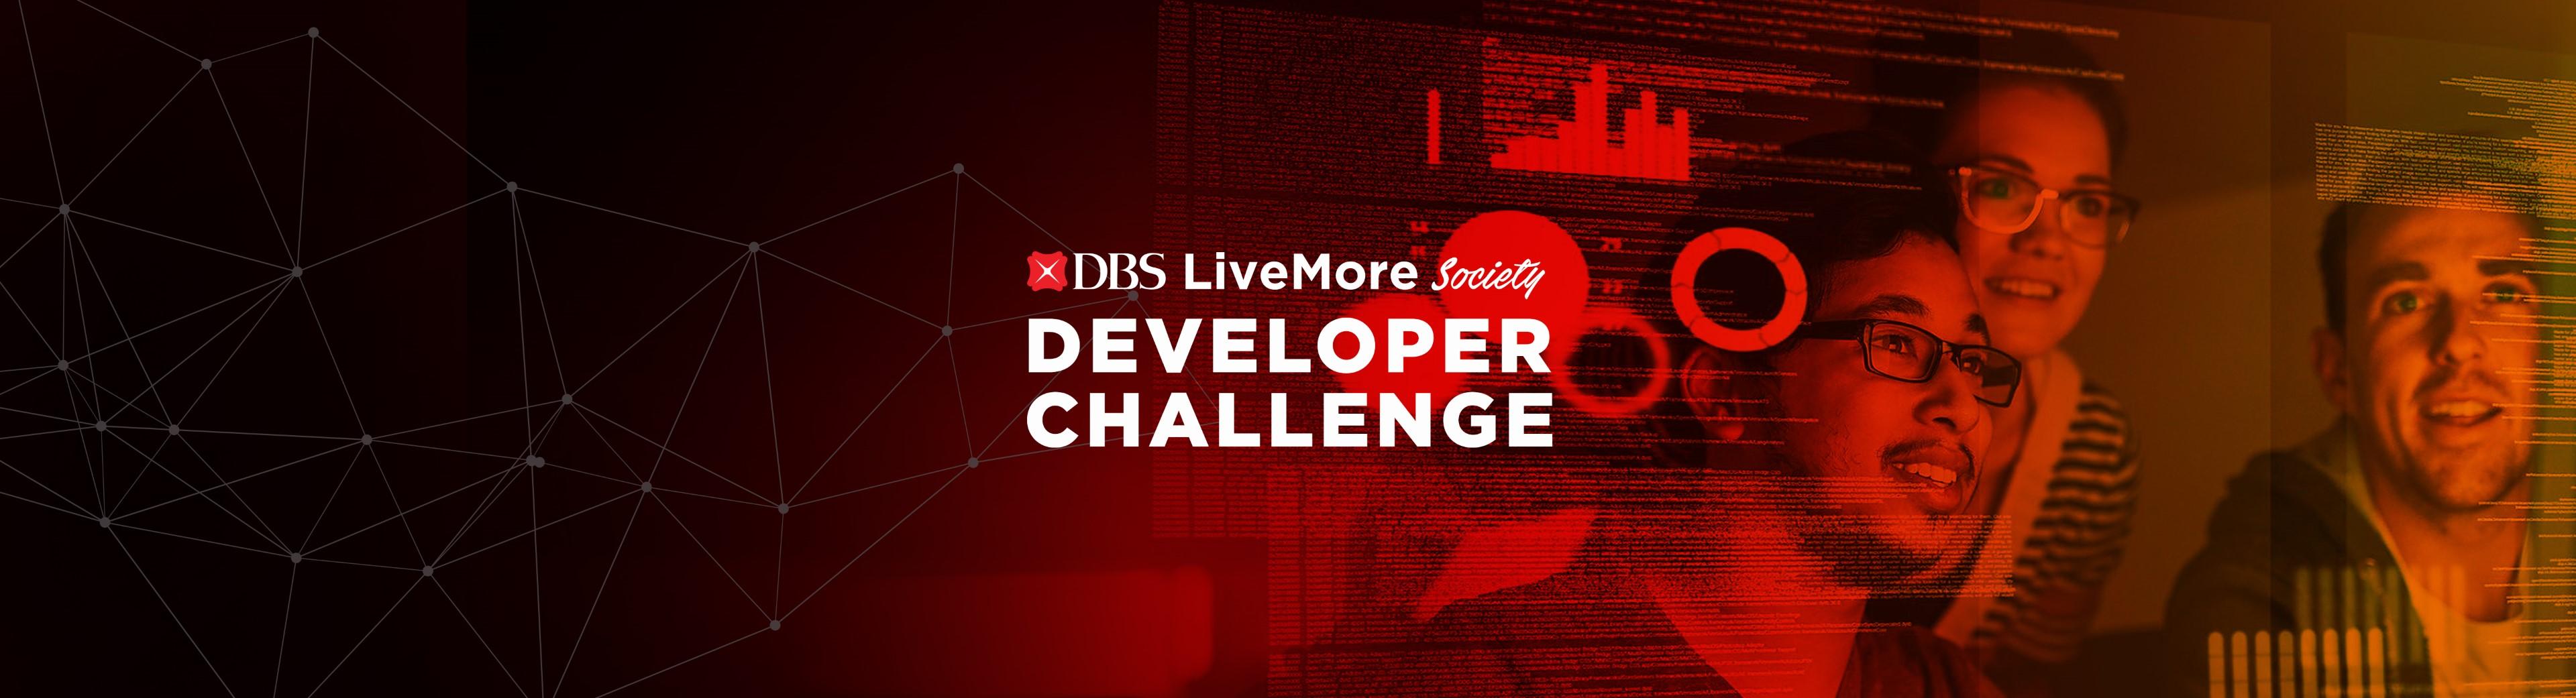 DBS Live More Society: Developer Challenge 2